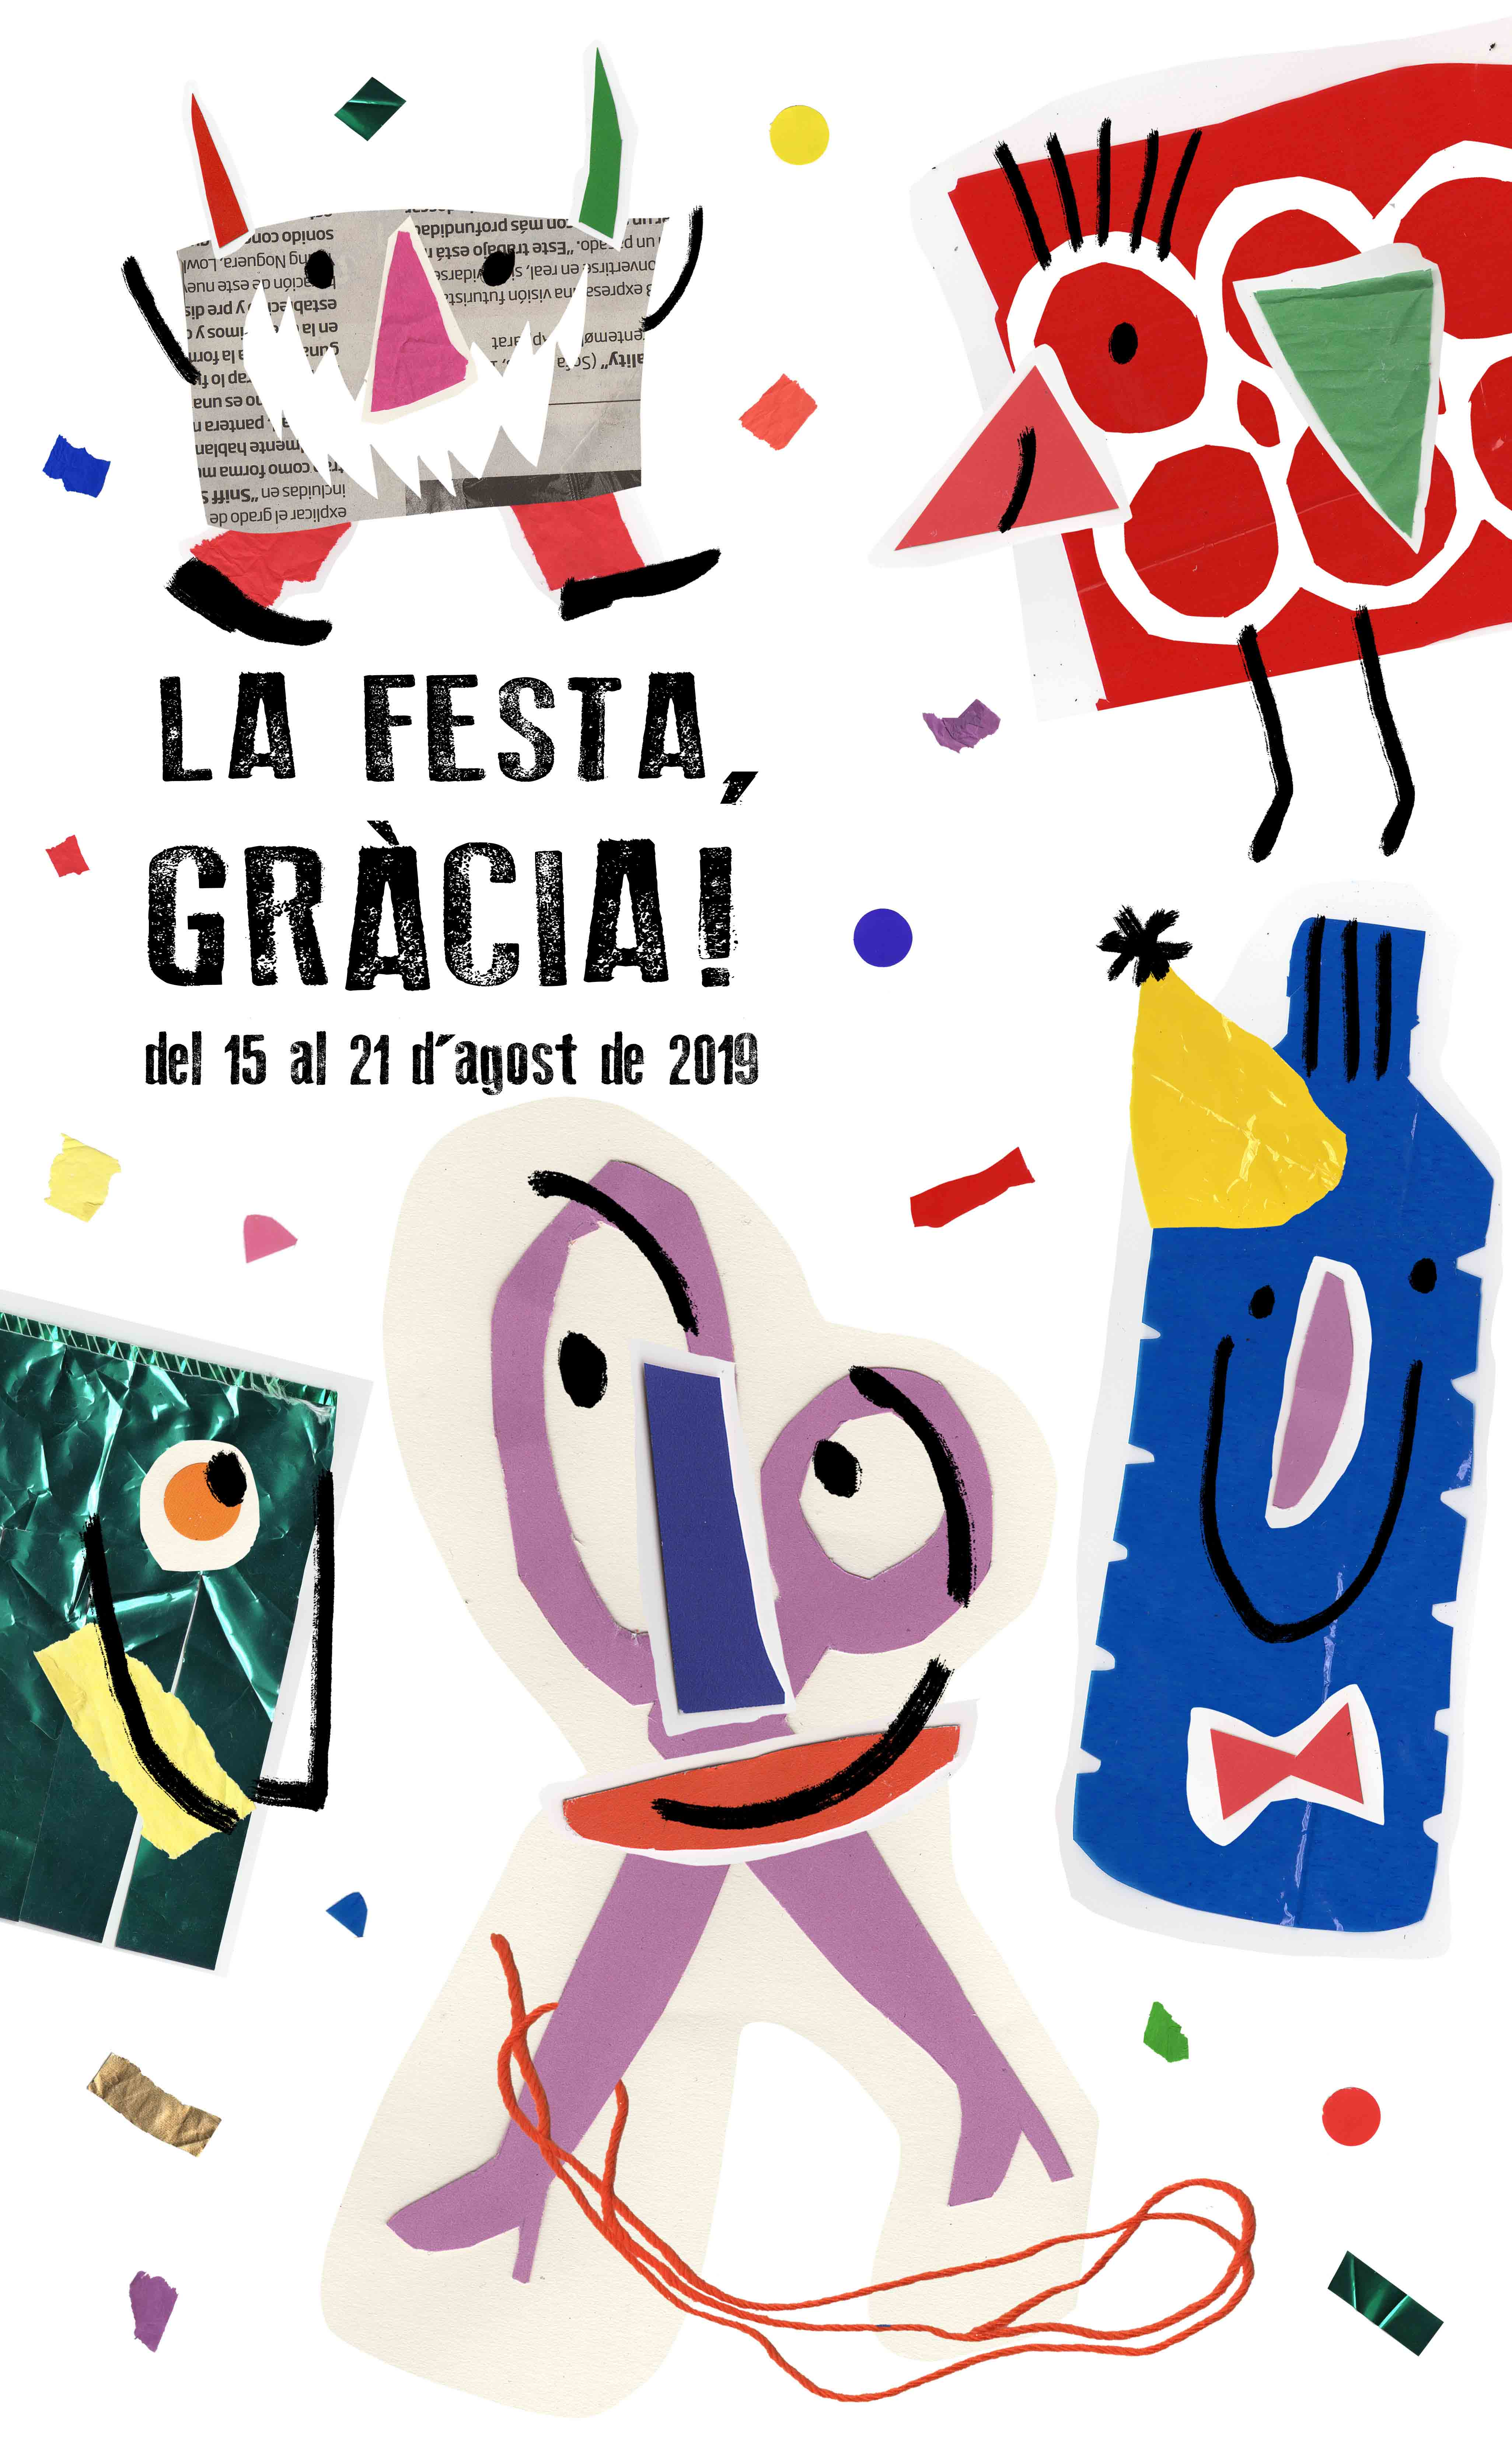 cartell - poster festa de gracia 2019